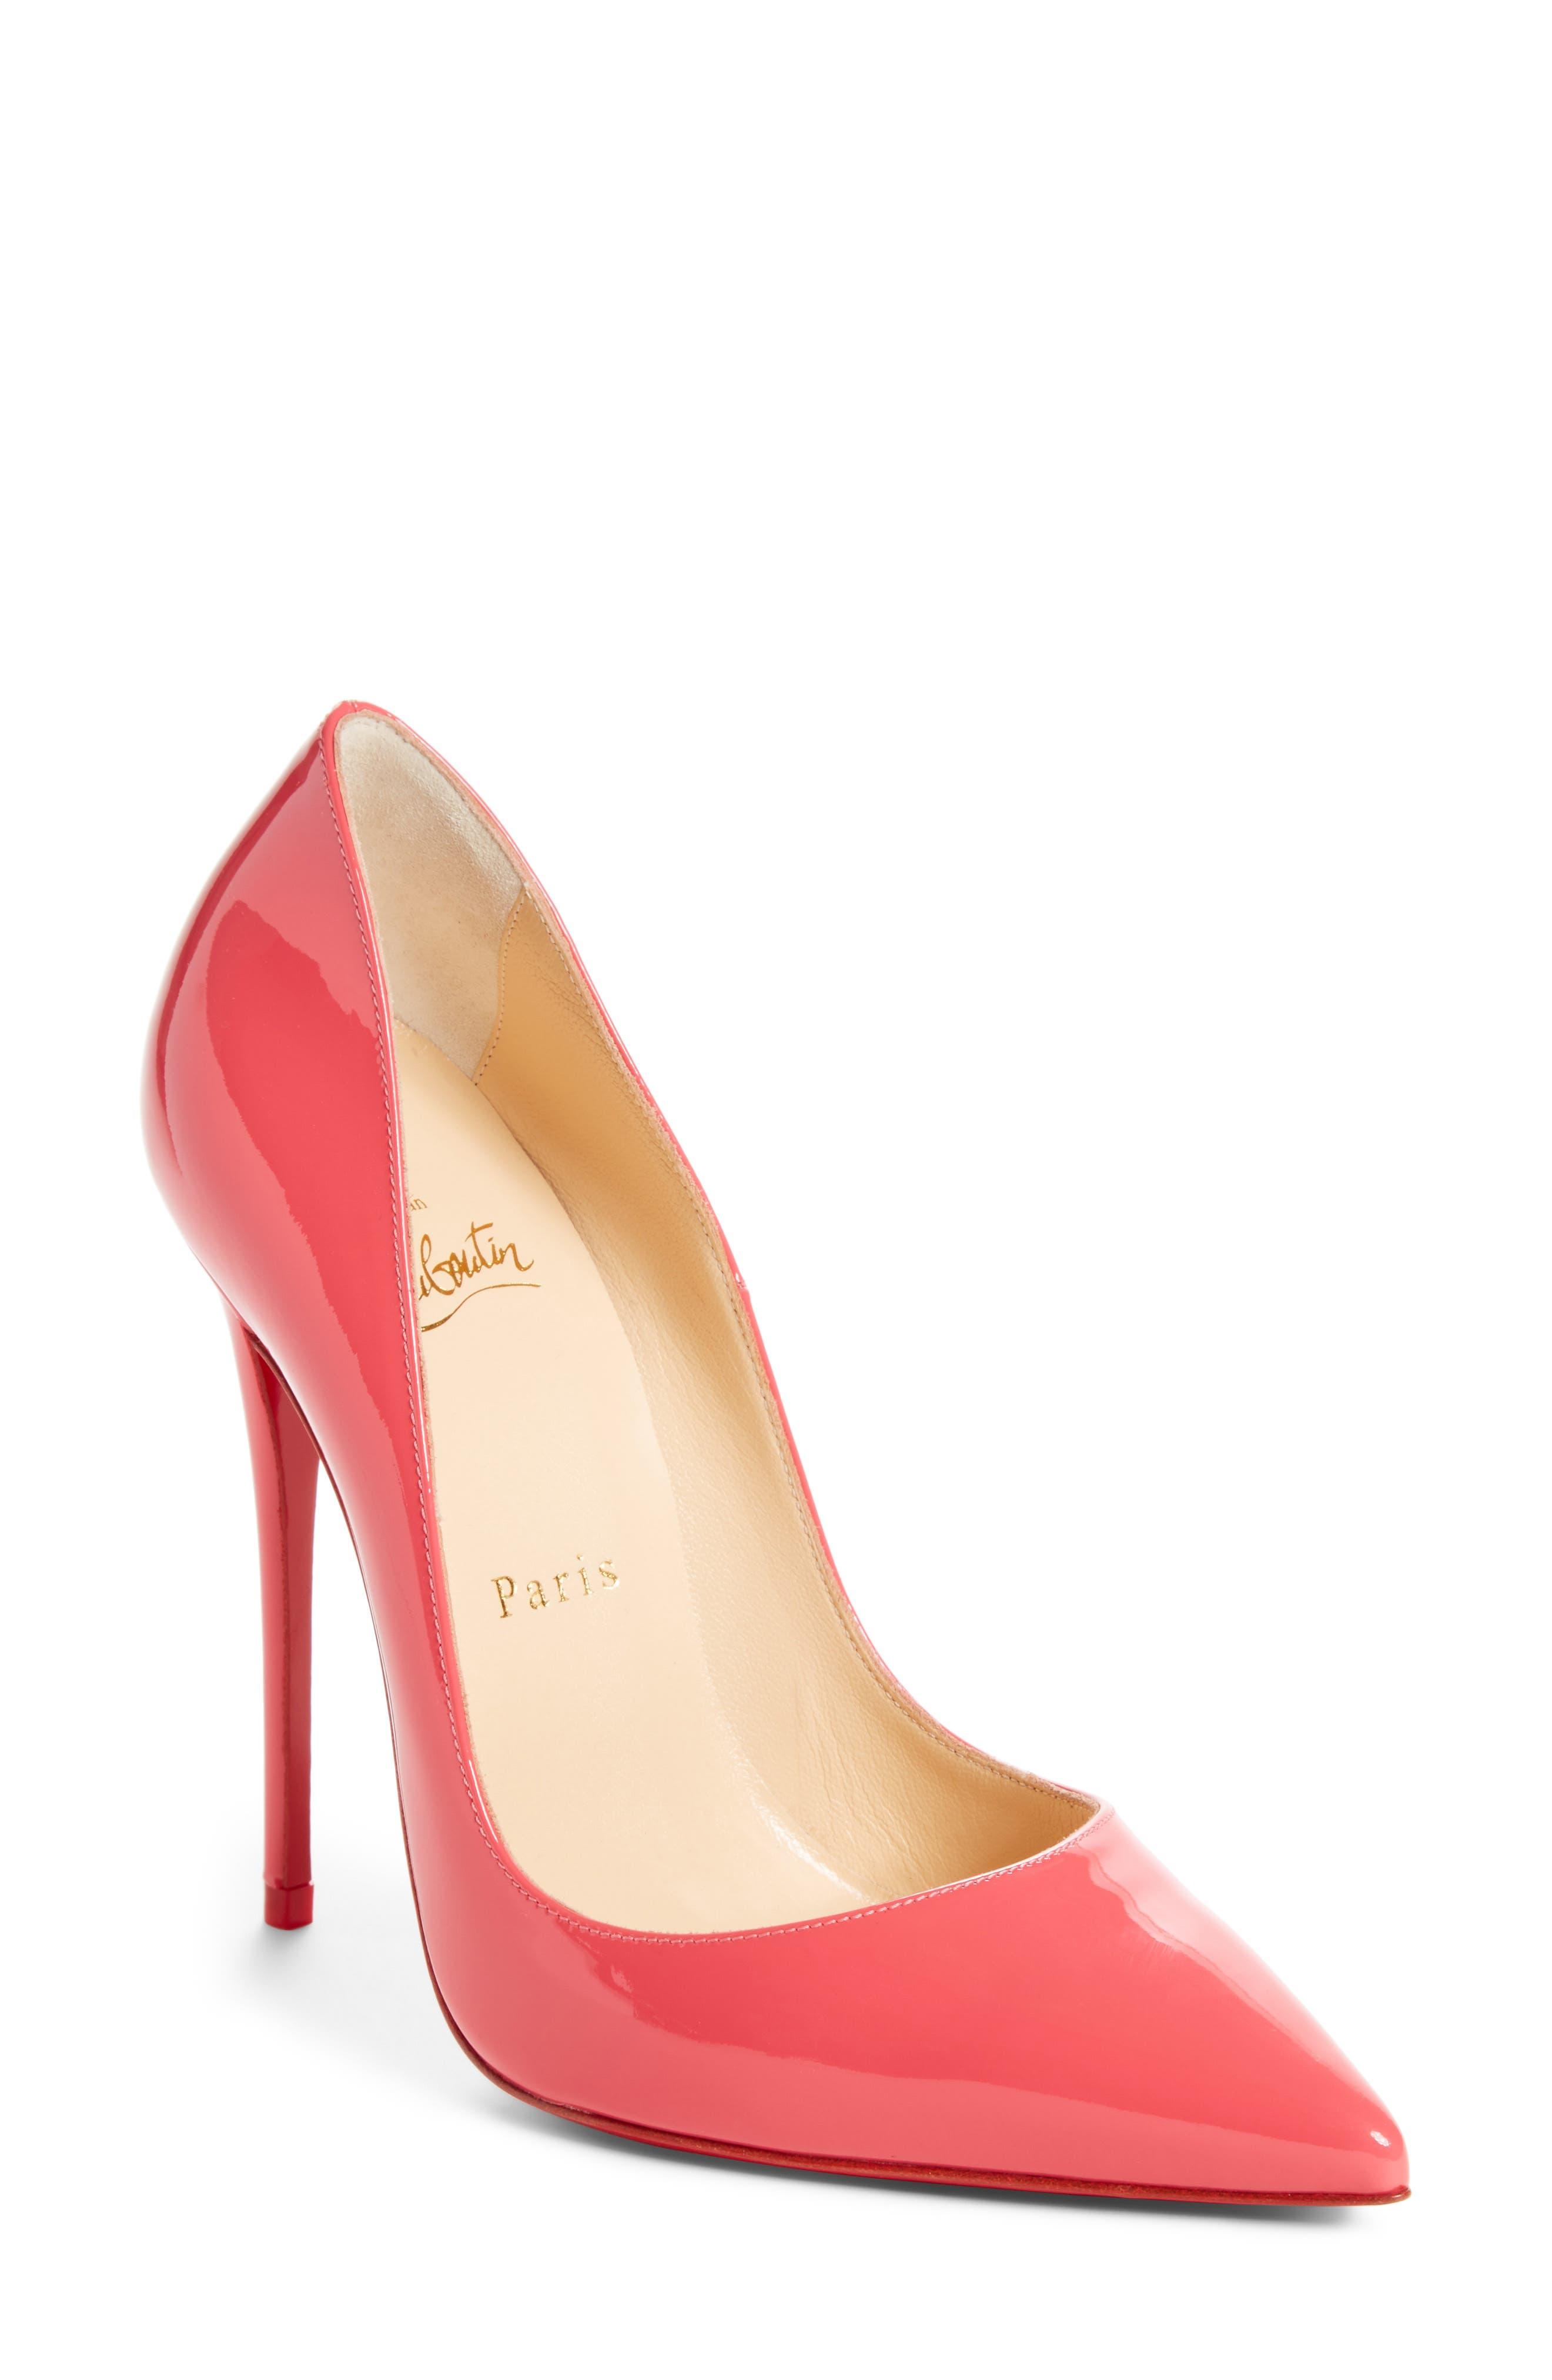 Pink Womens Heels b6ia7qds